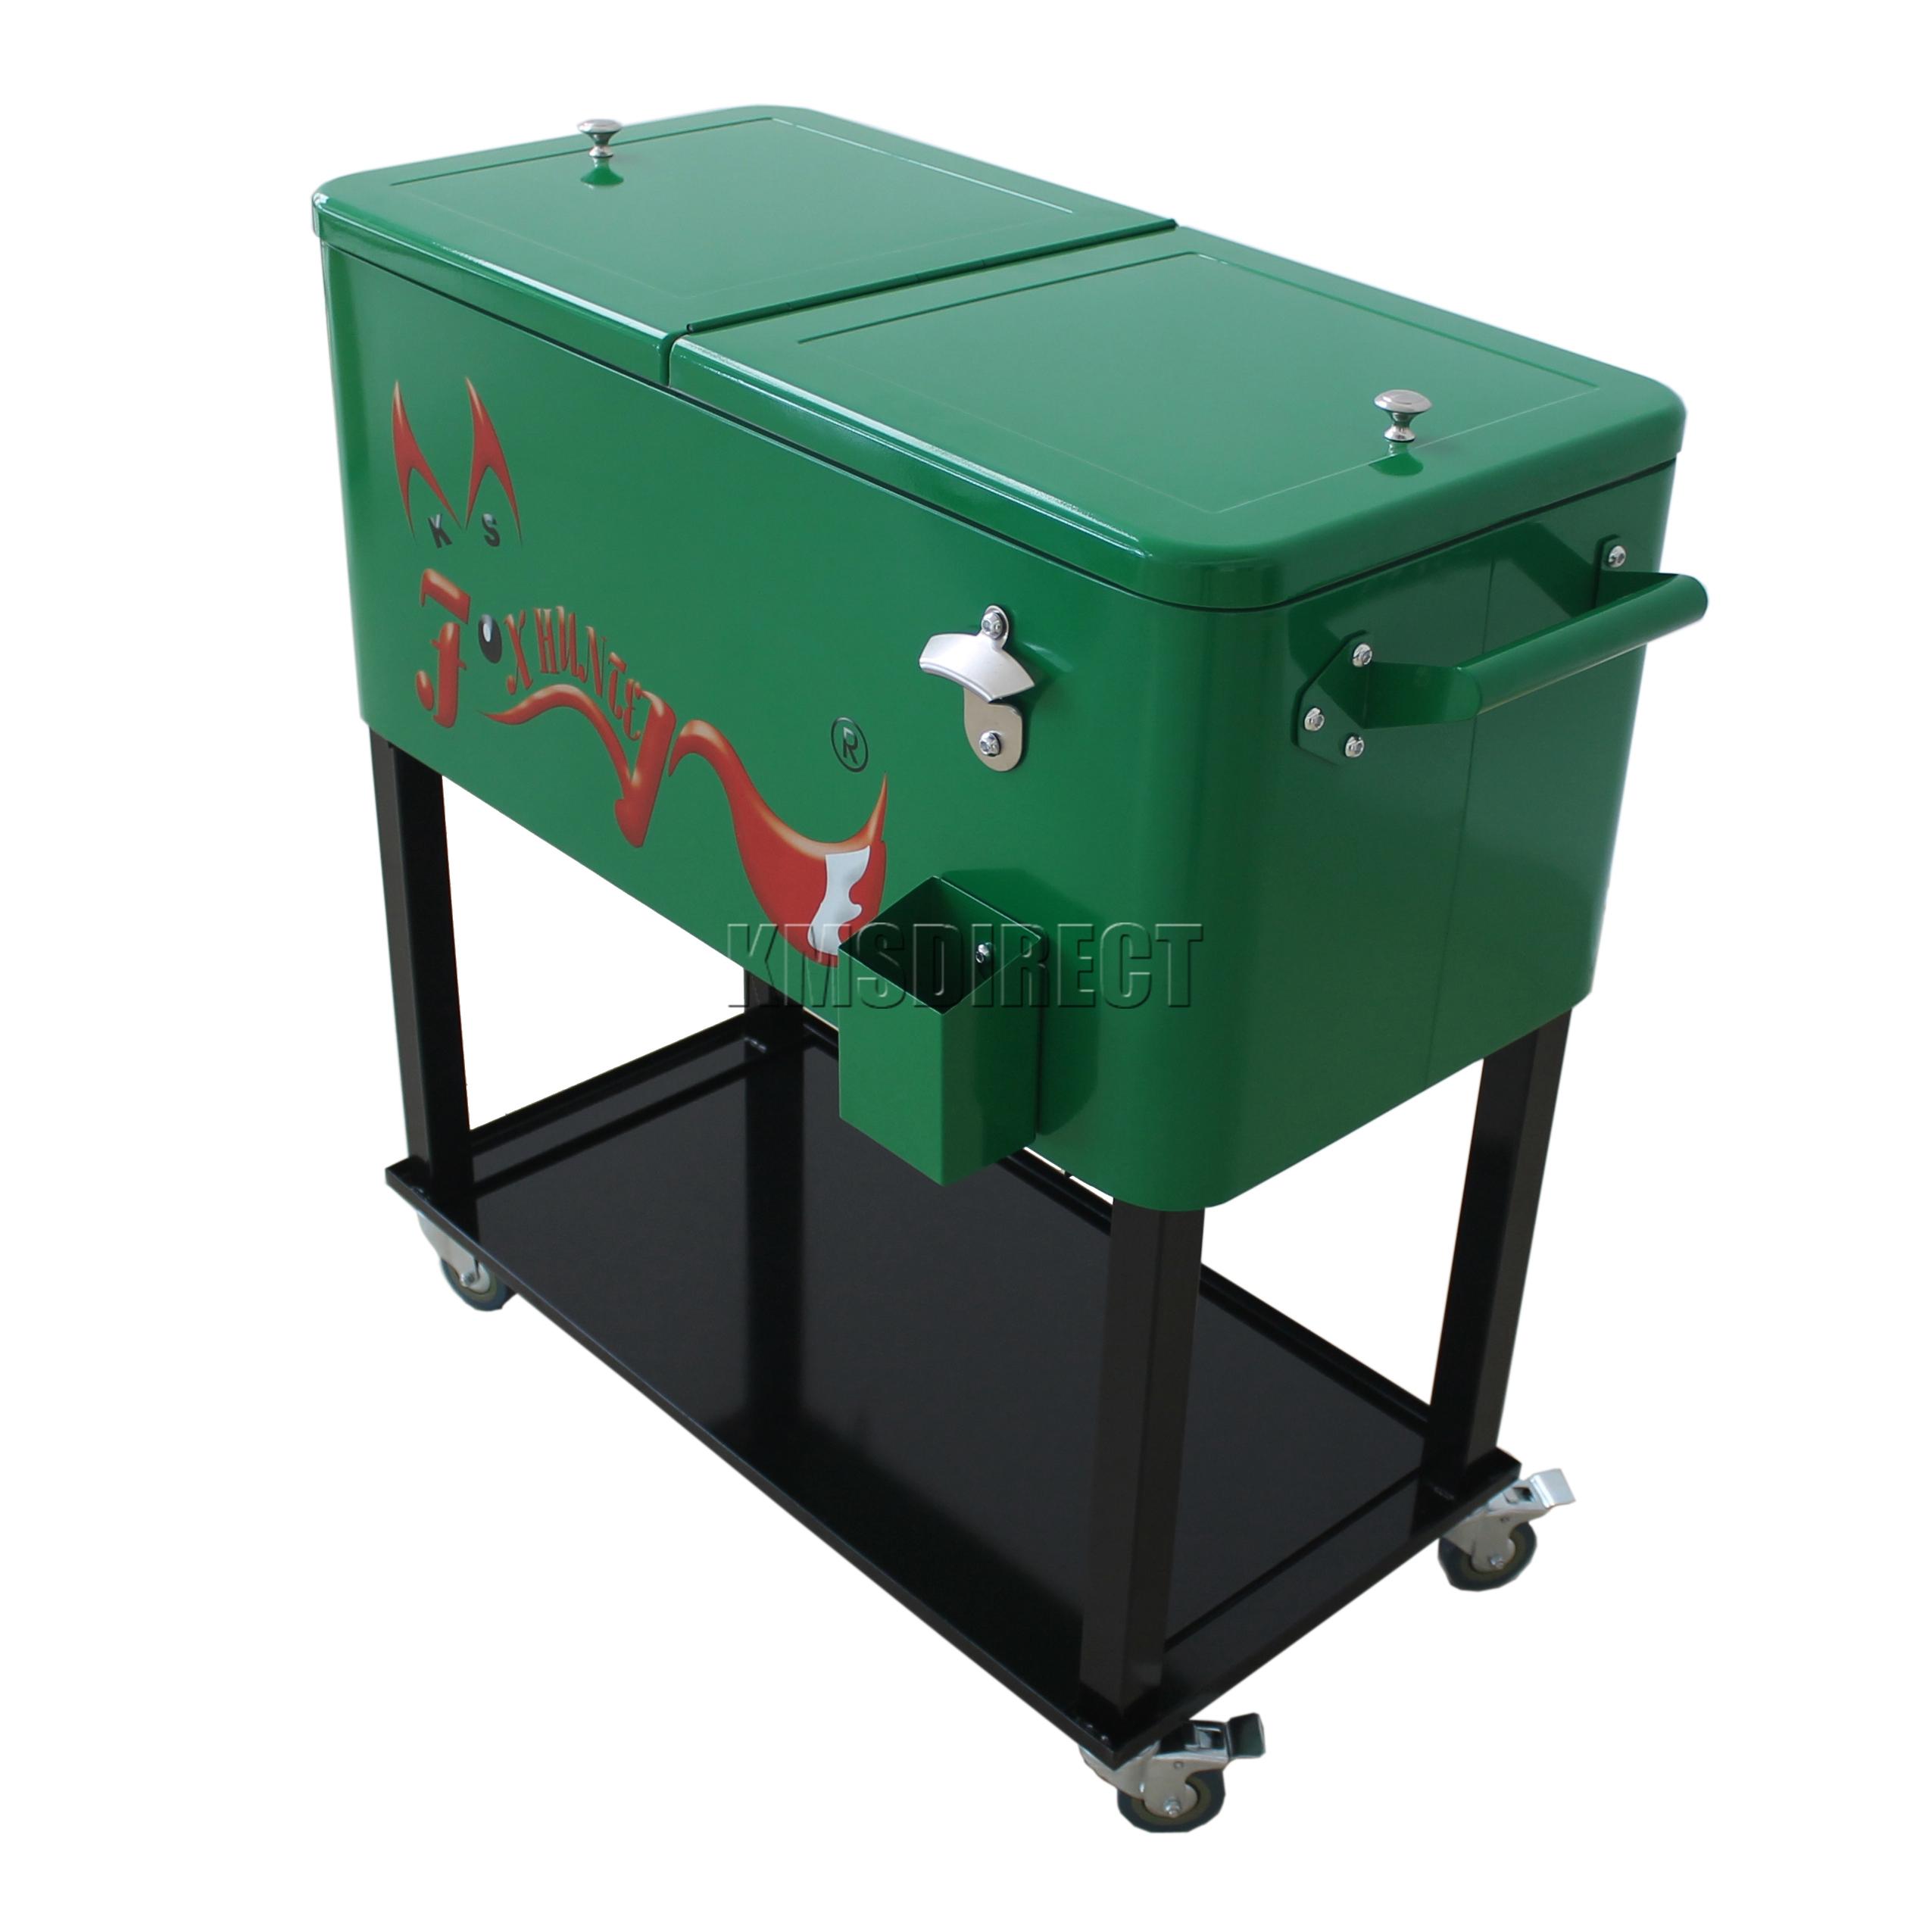 Patio Deck Cooler Rolling Outdoor: FoxHunter Patio Deck Ice Cooler Rolling Cart Outdoor 65